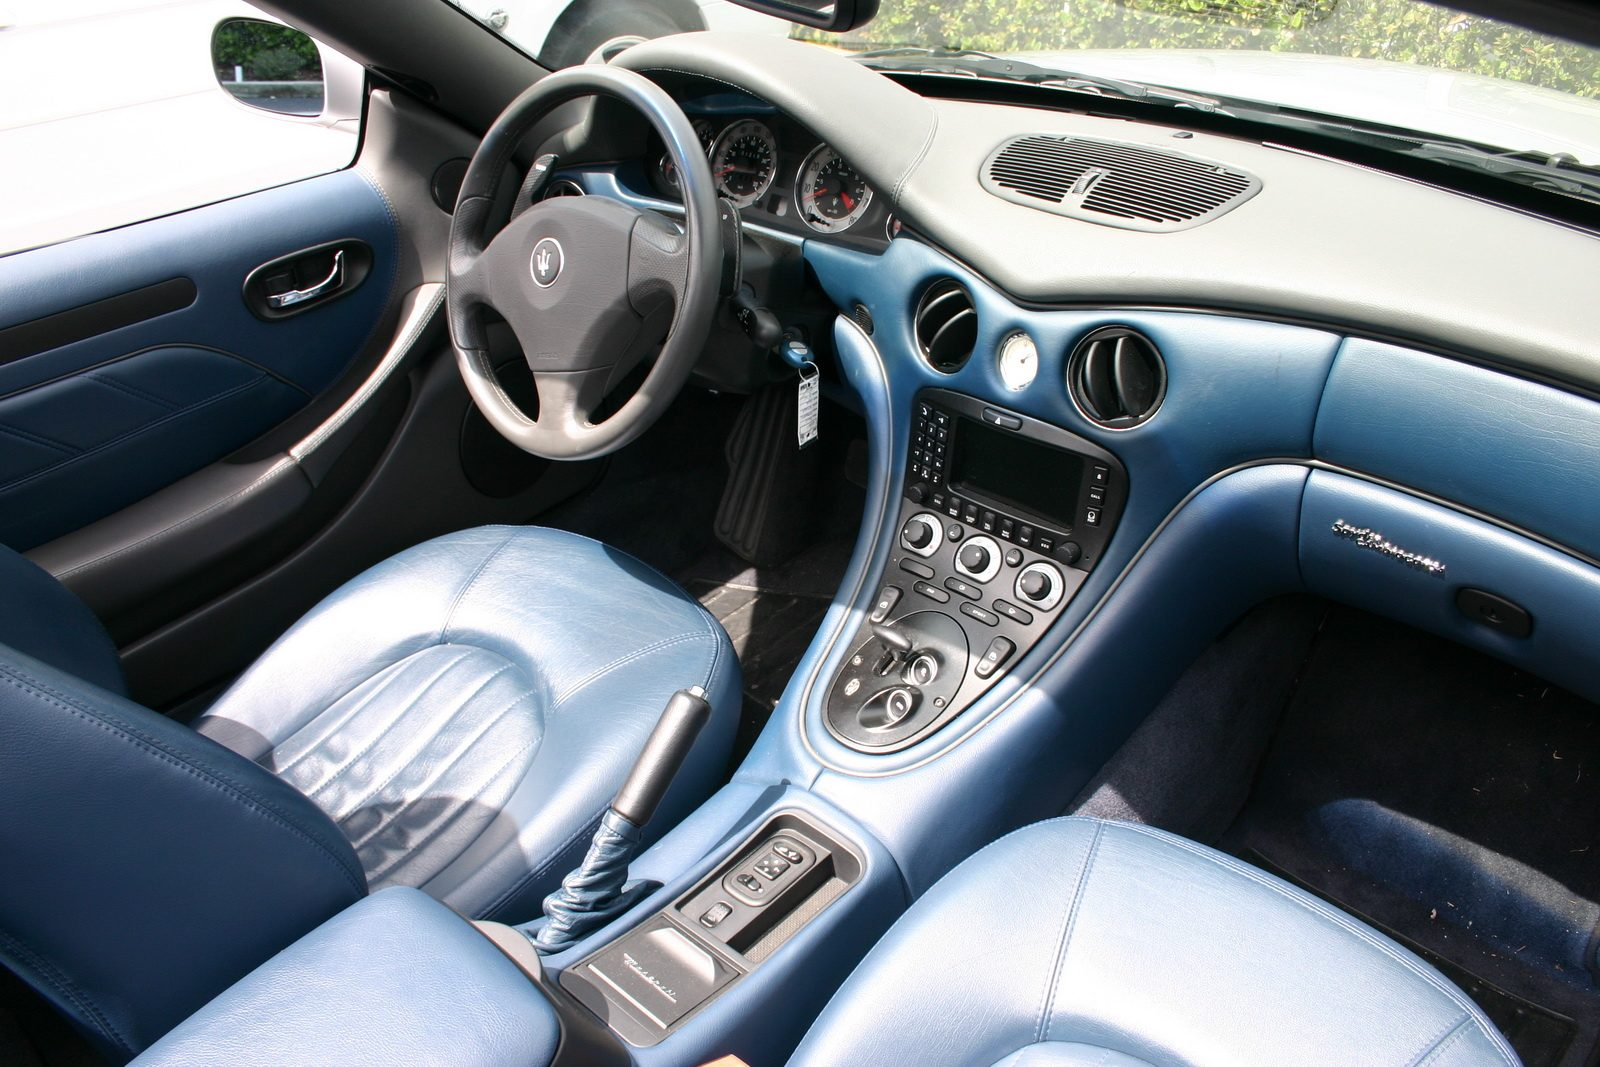 Maserati Spyder 90th Anniversary Edition 2004